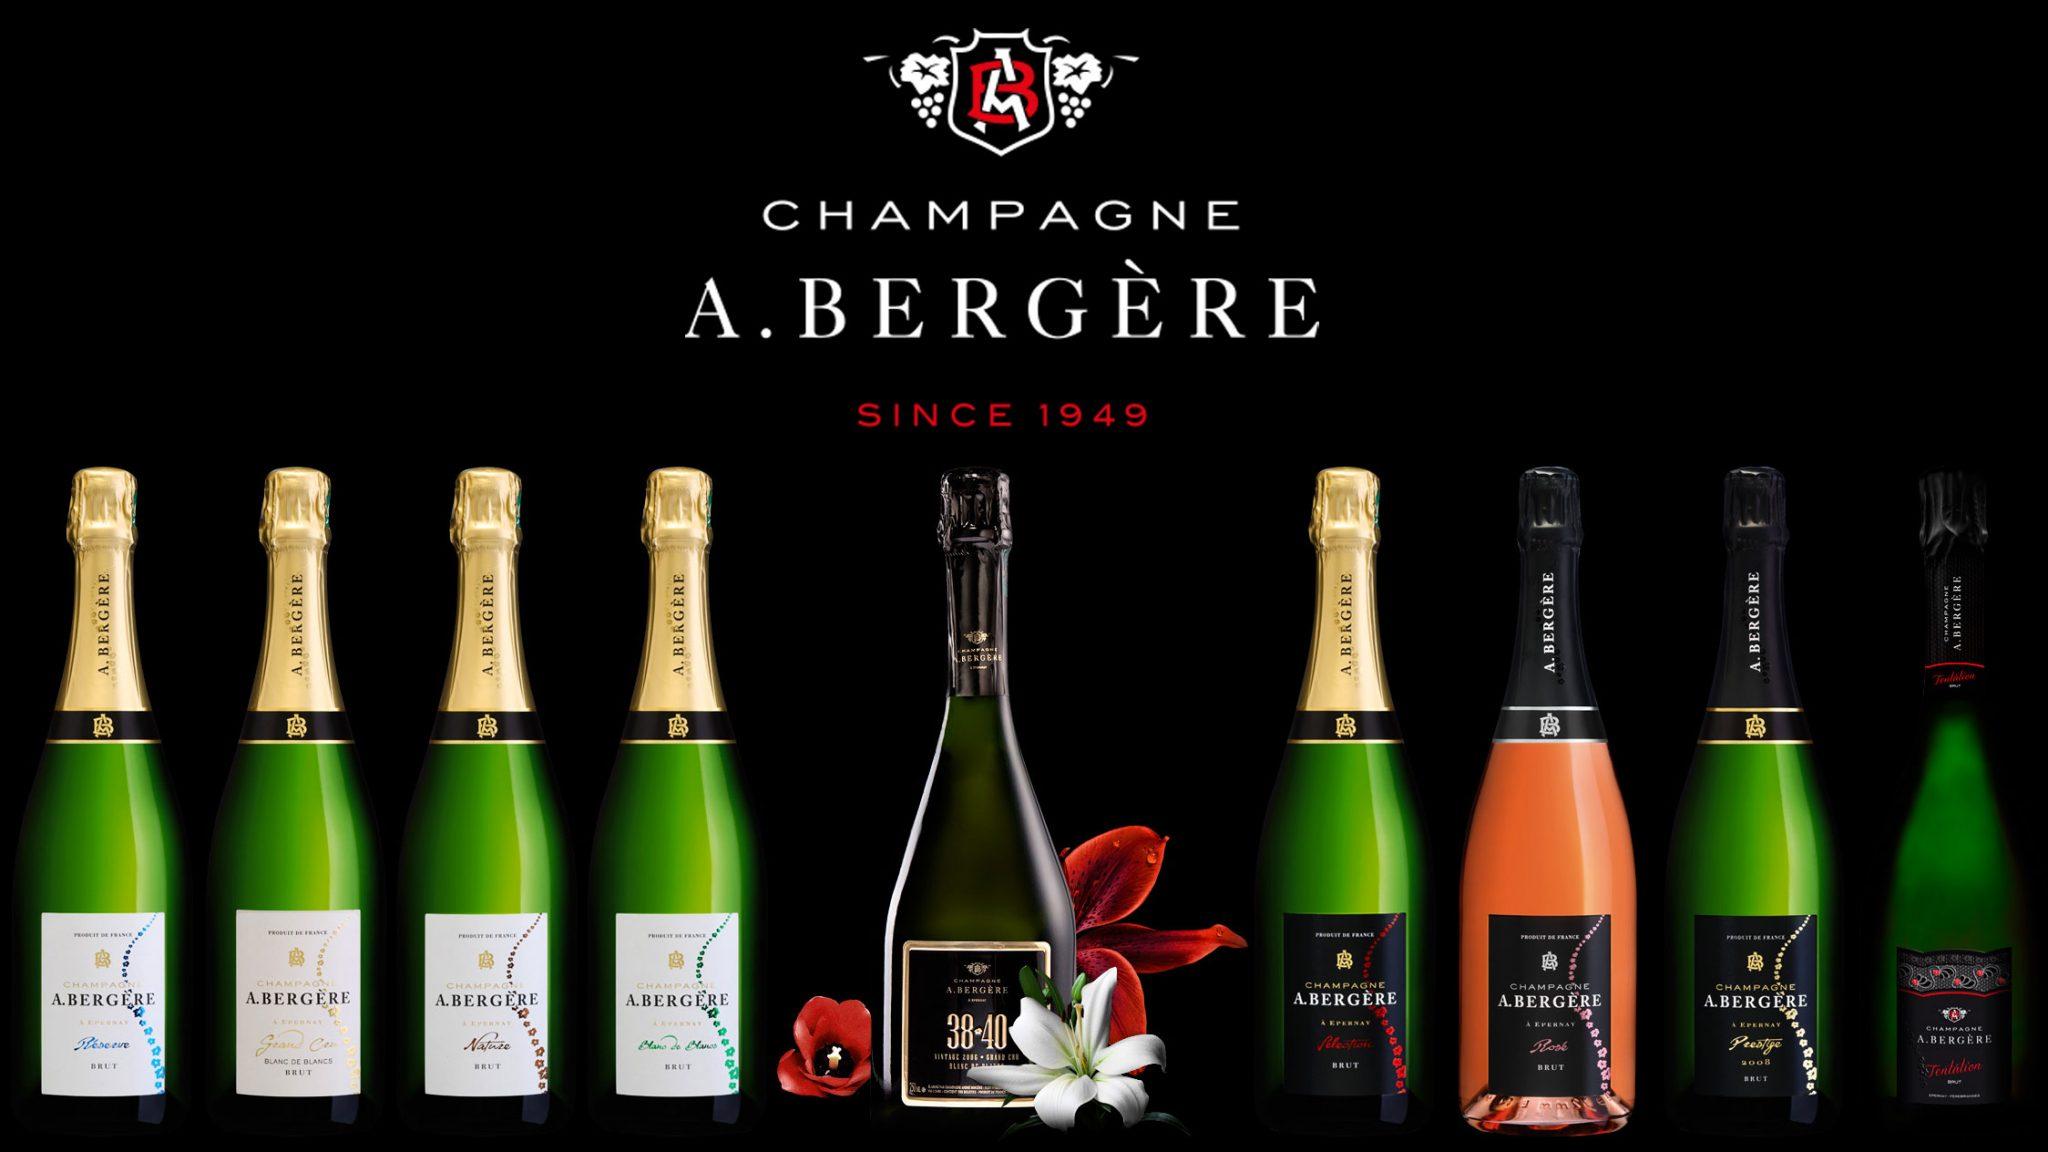 Champagne A. Bergere